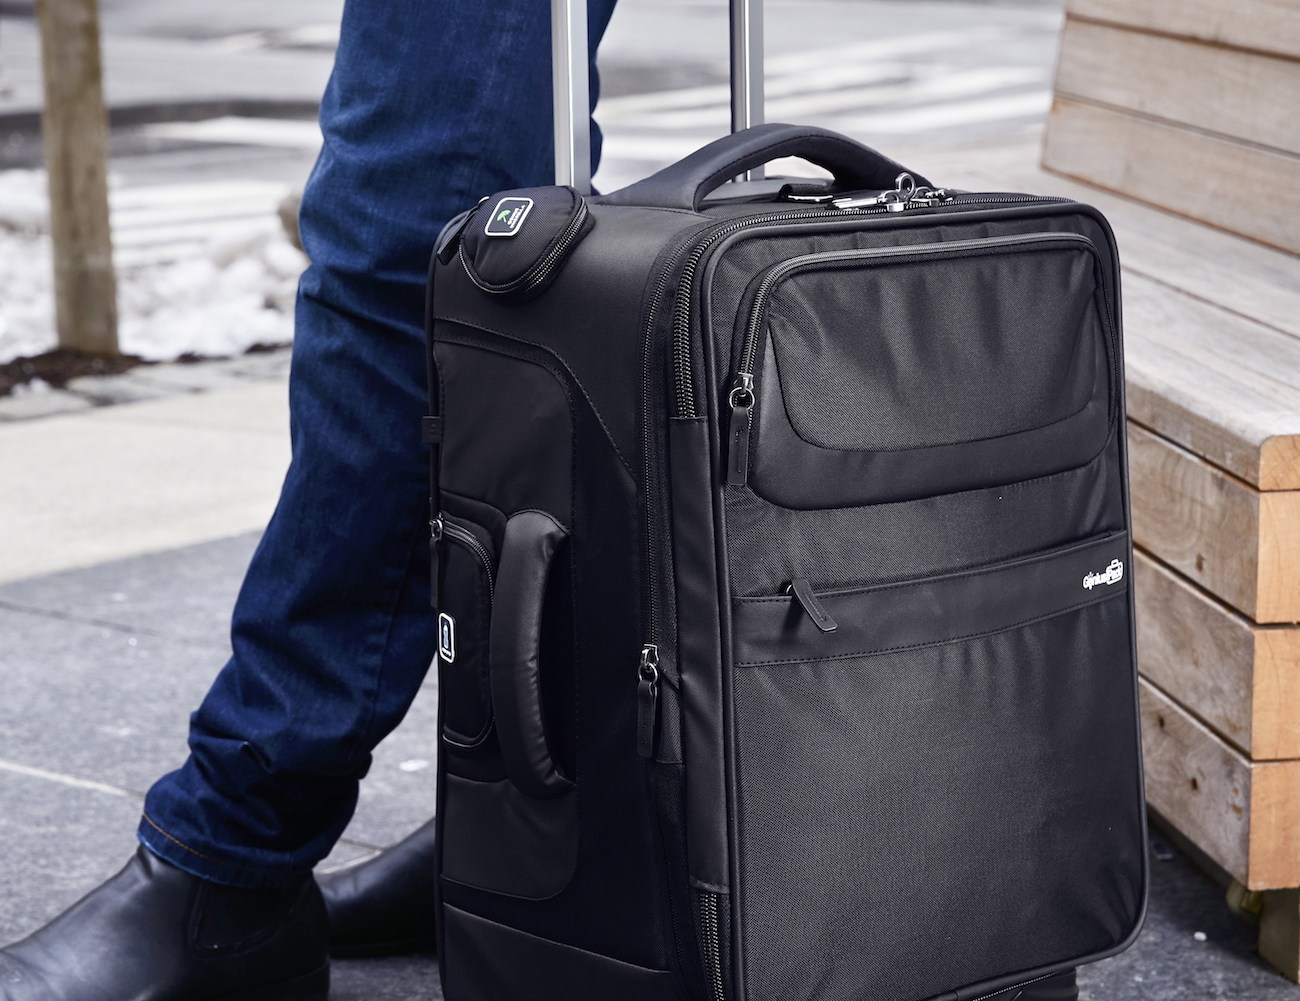 Genius Pack G3 Carry-On Spinner